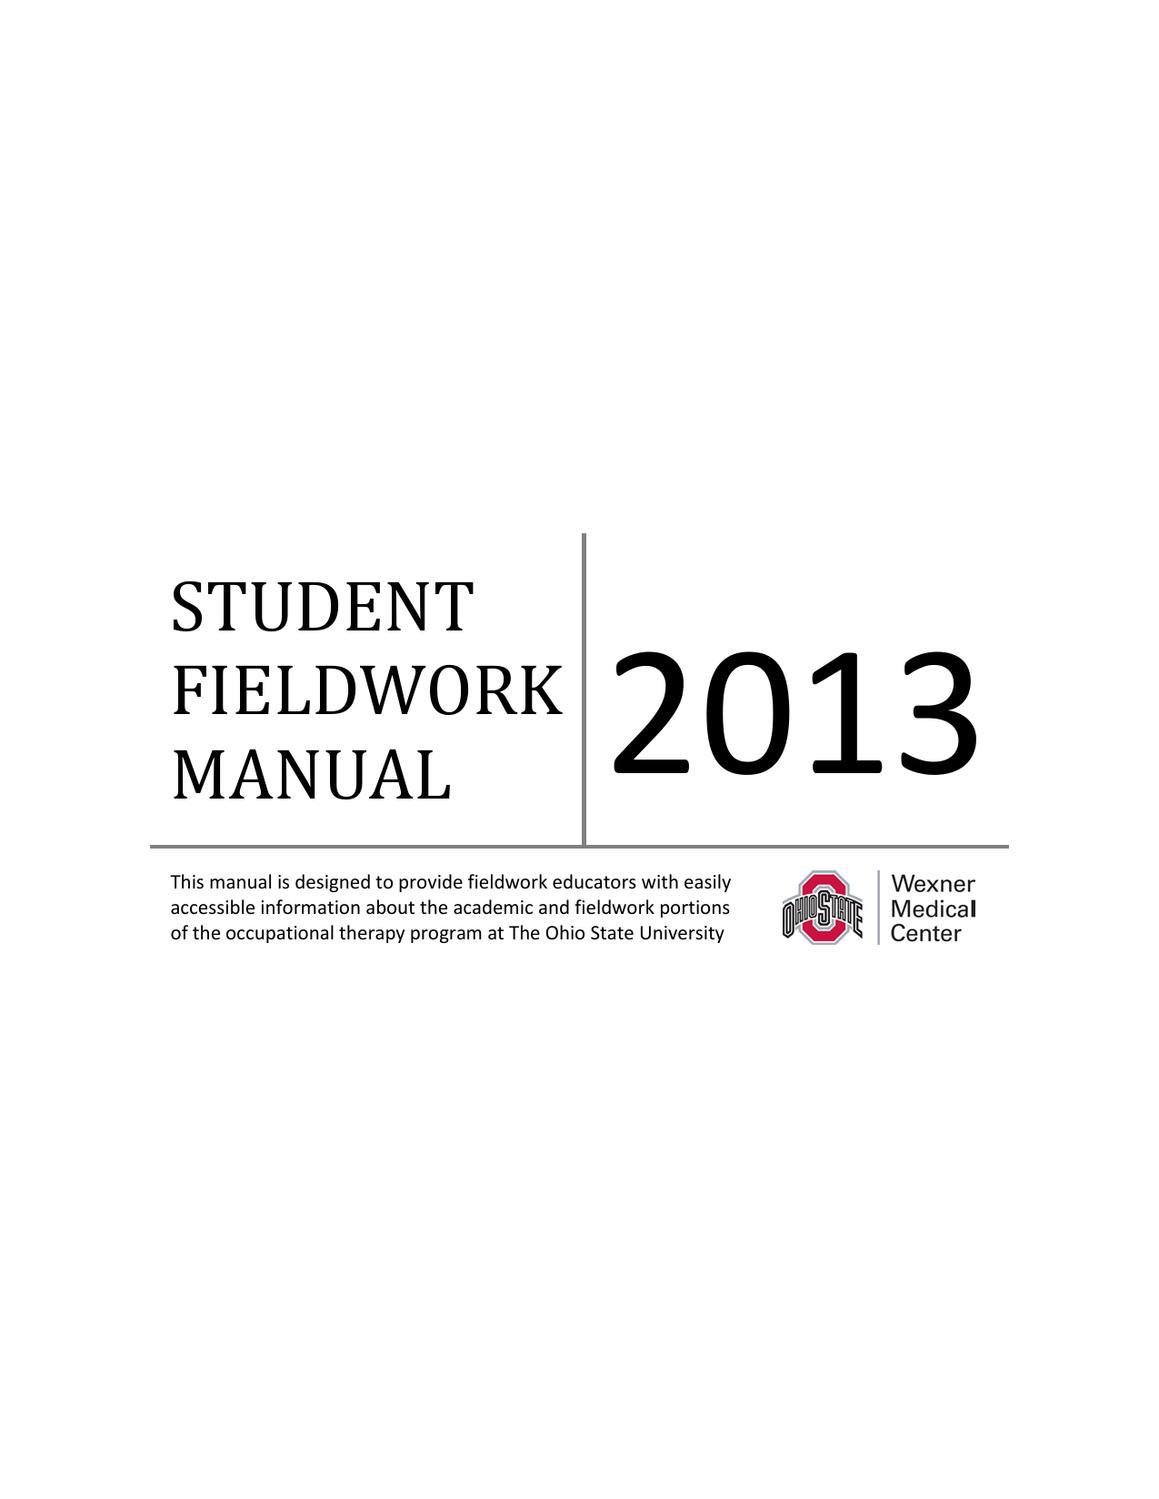 Fieldwork Manual 2013 By Cristina Capretta Issuu